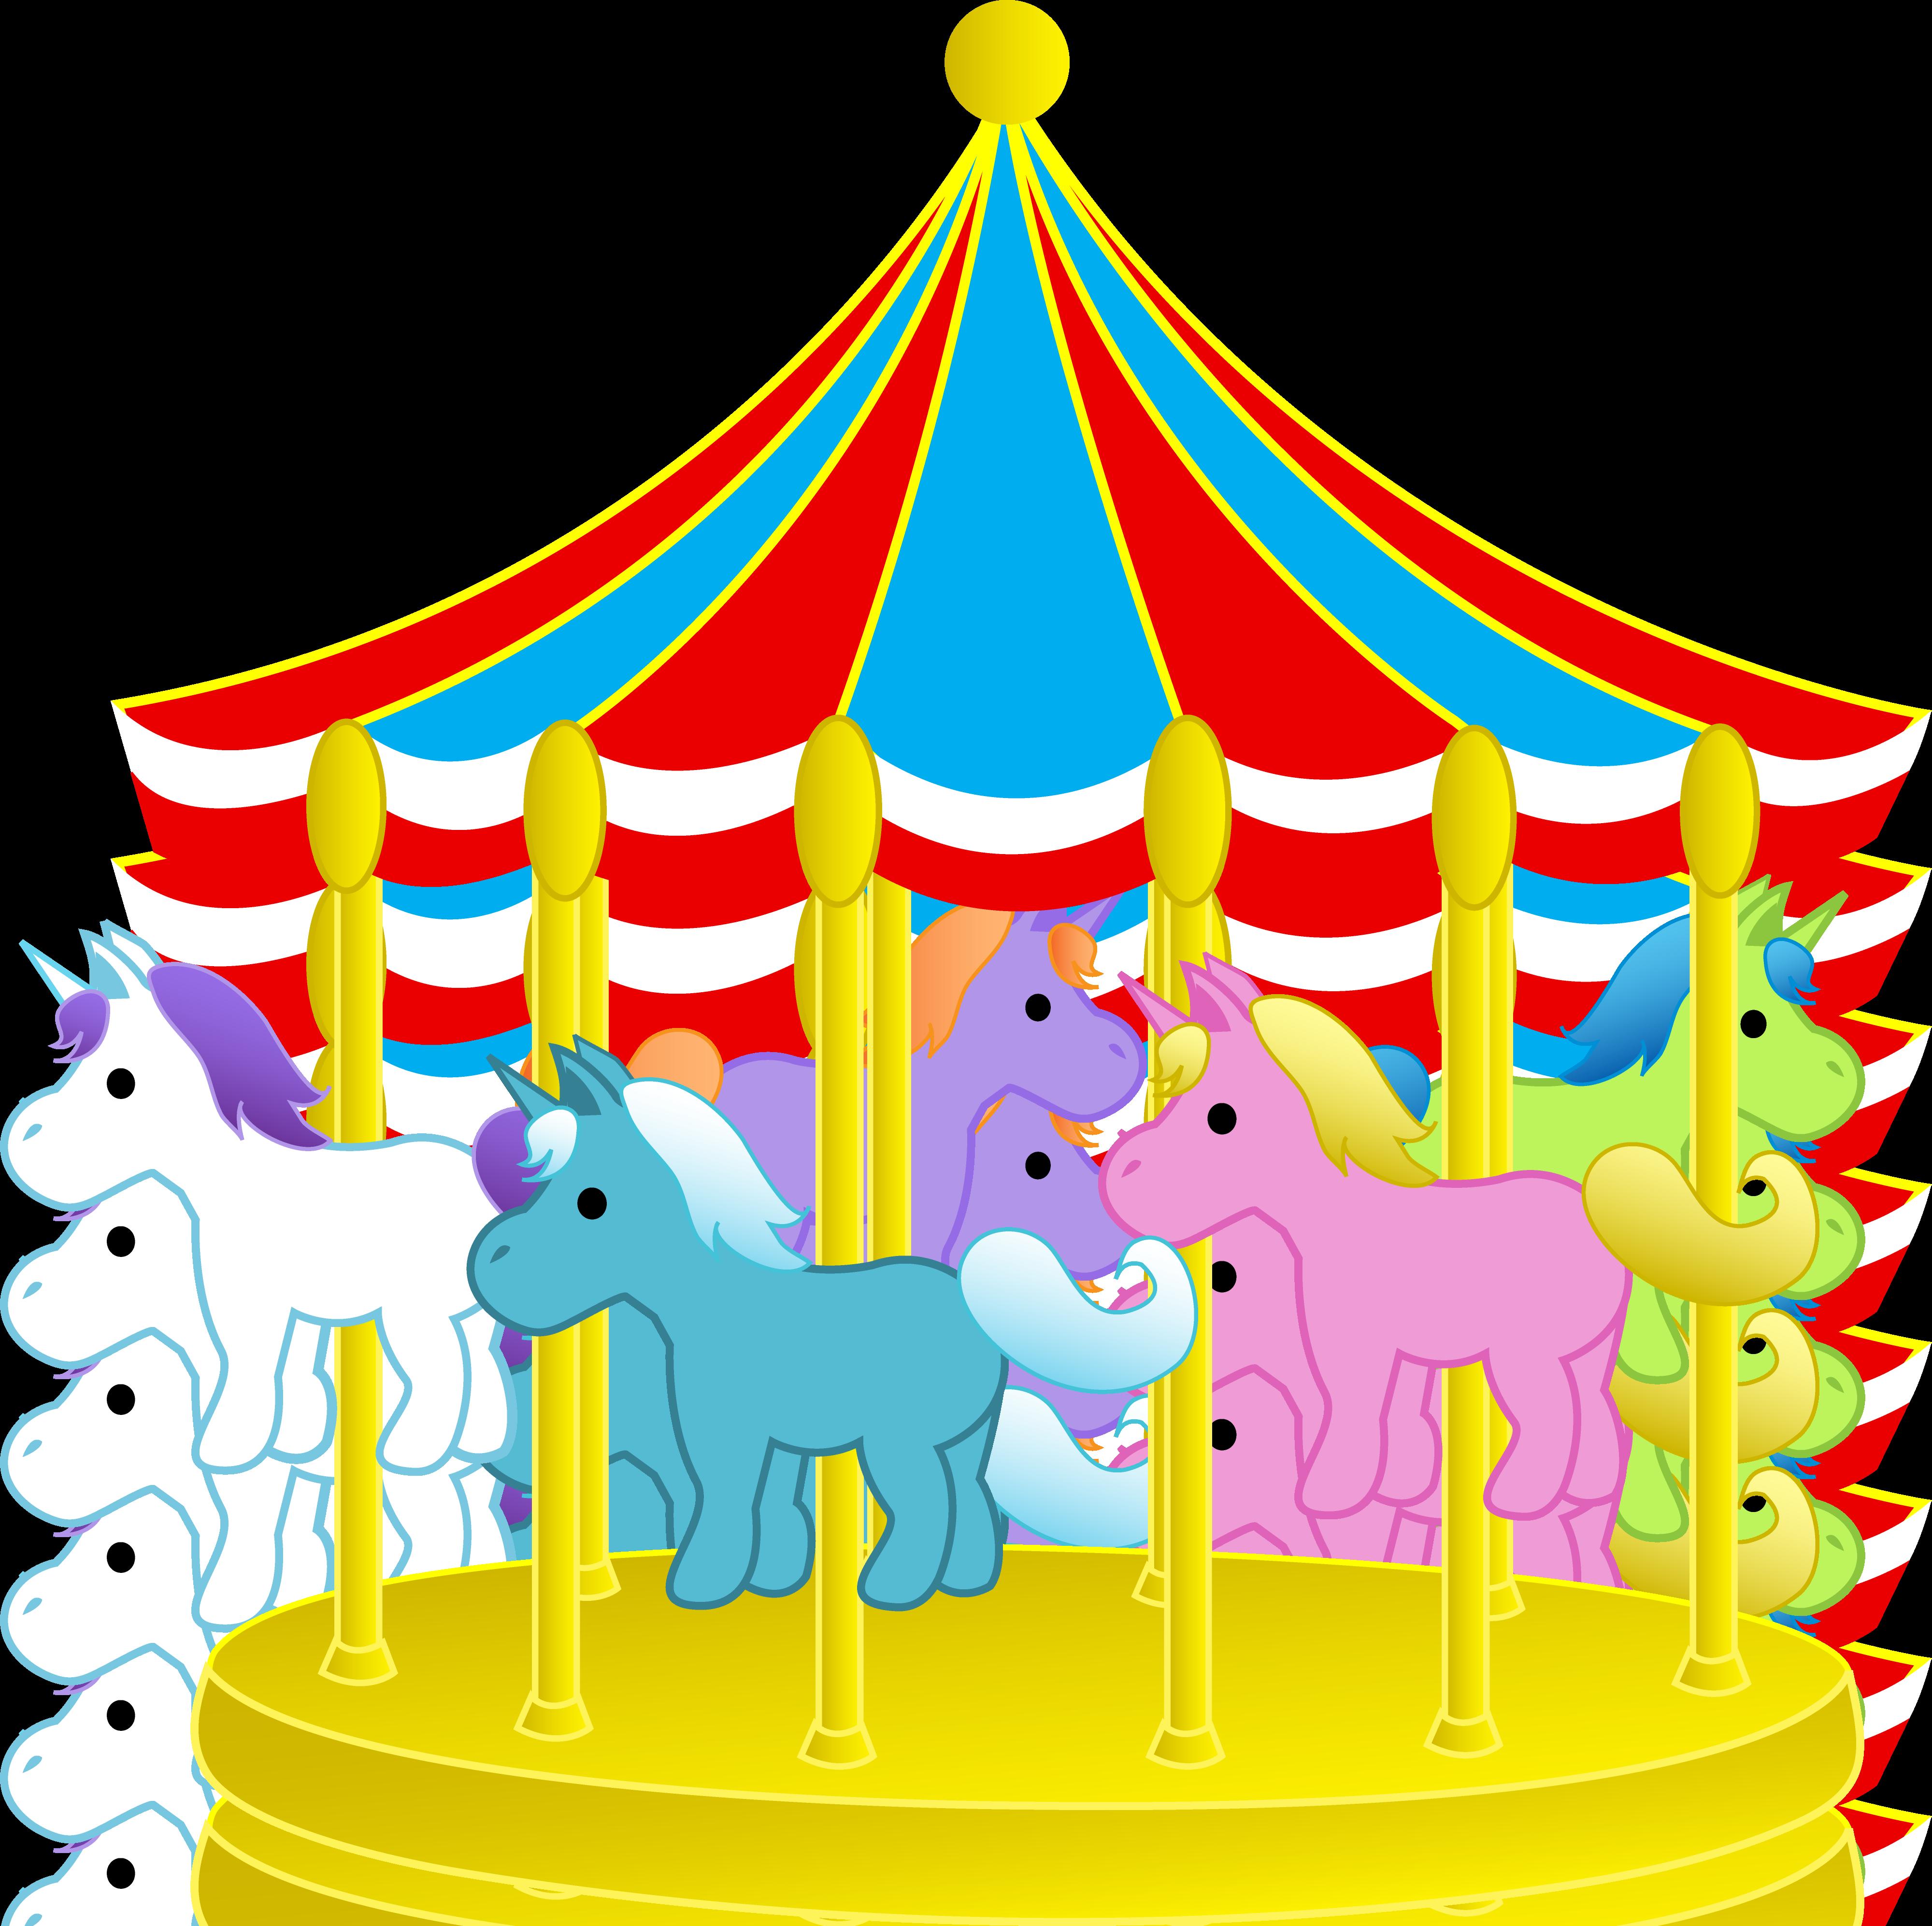 Cute Carnival Carousel With Ponies - Free Clip Art. Amusement Park Clip Art - Clipart